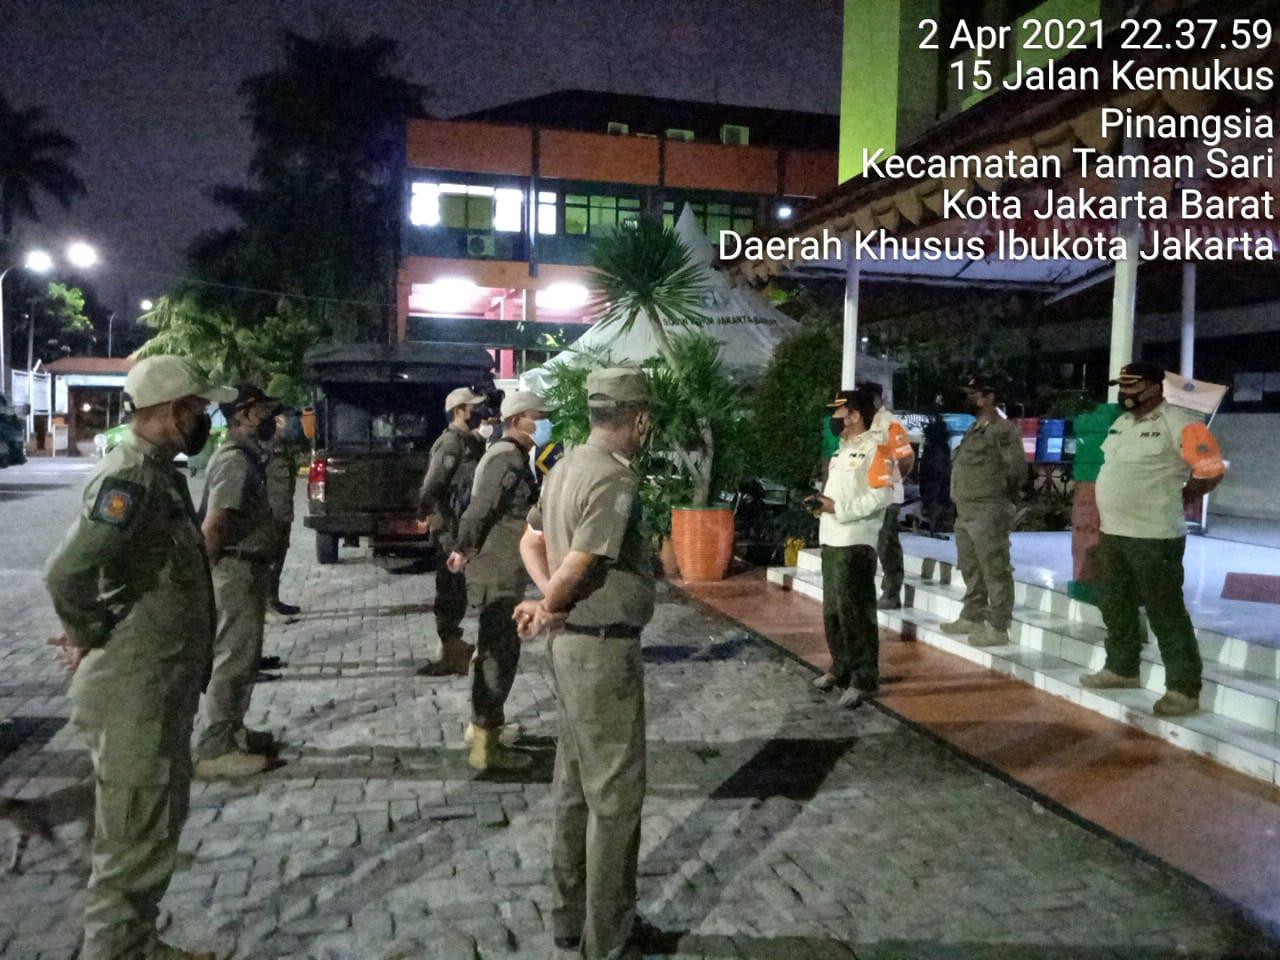 Satpol PP Kec.Tamansari, Gencarkan Operasi Malam Hari di Kawasan Mangga Besar